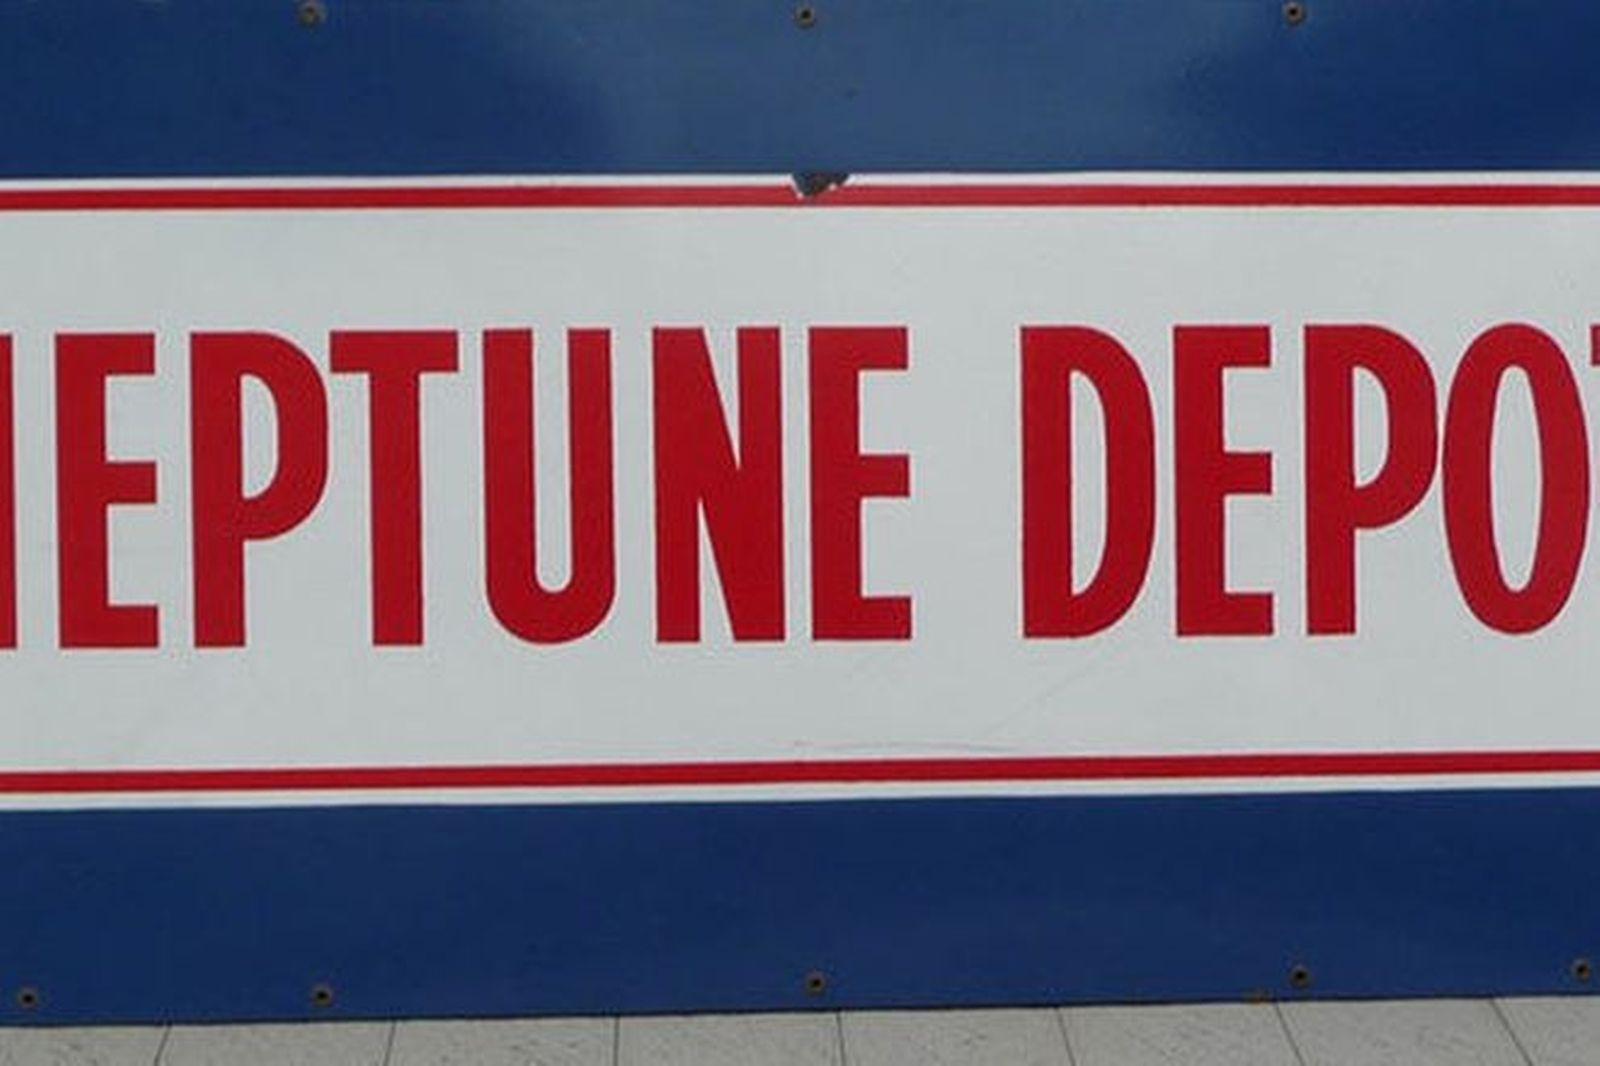 Enamel Sign - Neptune Depot (approx 185cm x 90cm)